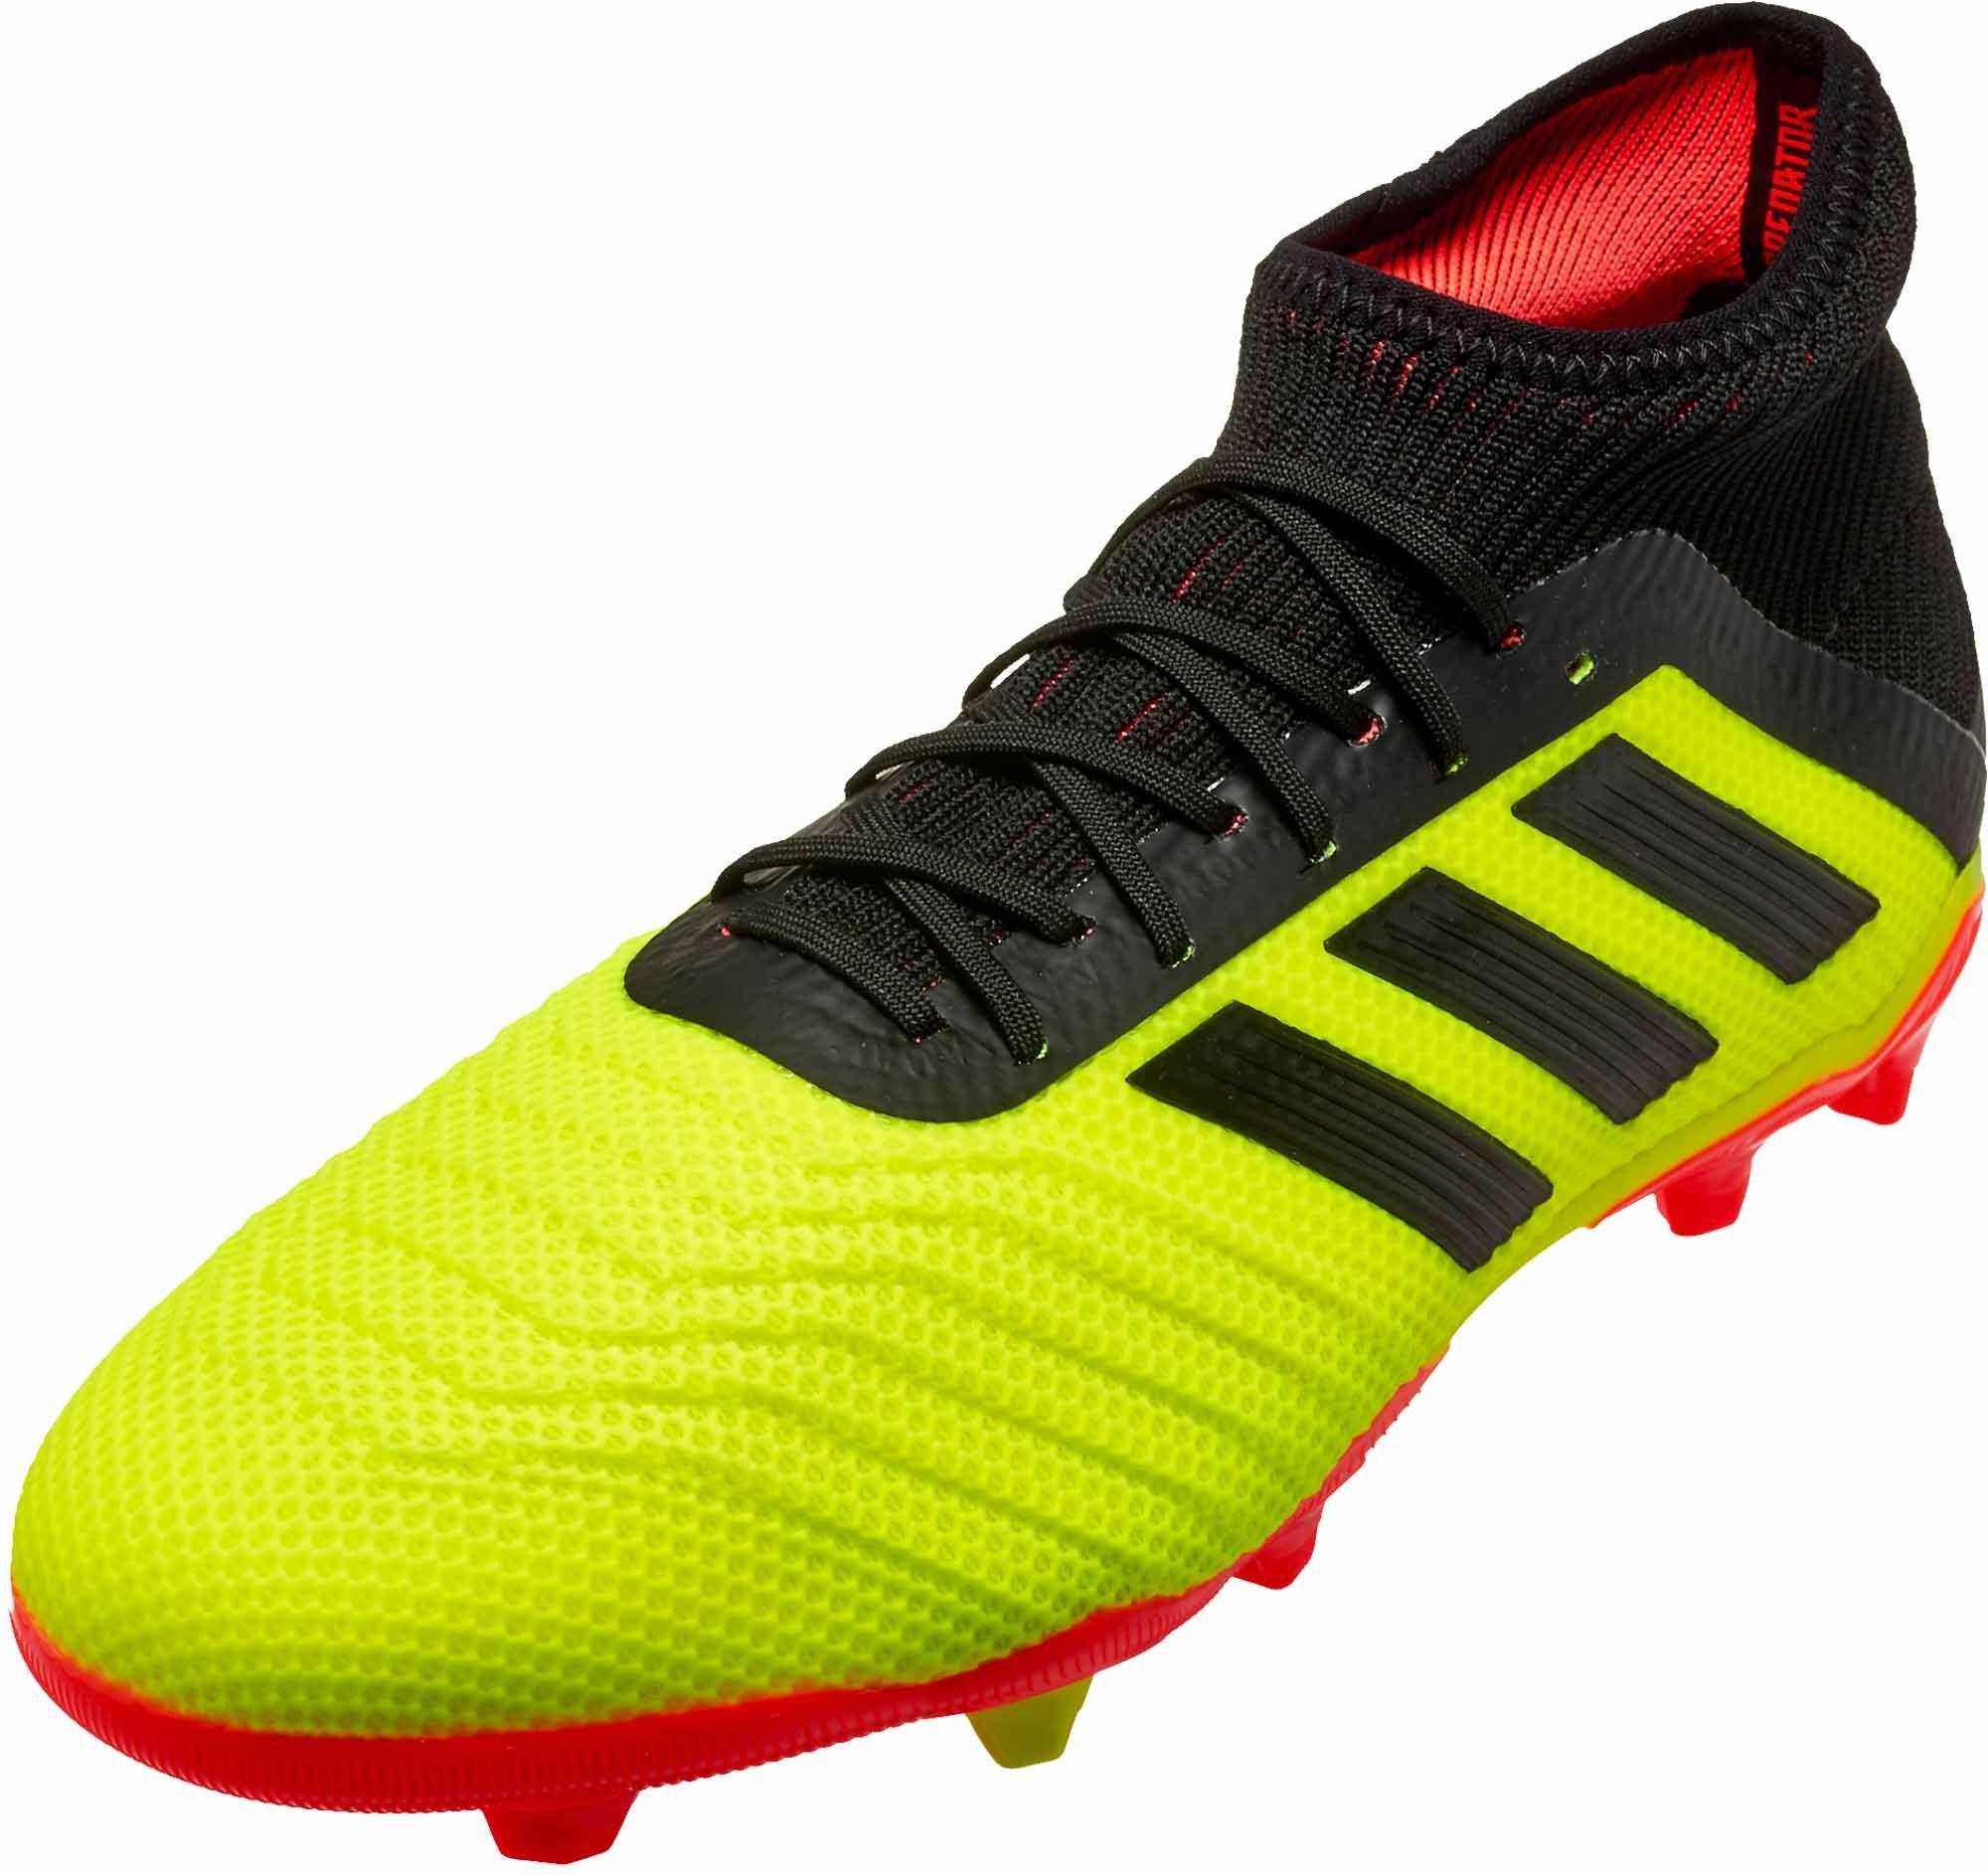 Kids Adidas Predator 18 1 Fg Energy Mode Soccerpro In 2020 Adidas Soccer Shoes Adidas Predator Soccer Shoes